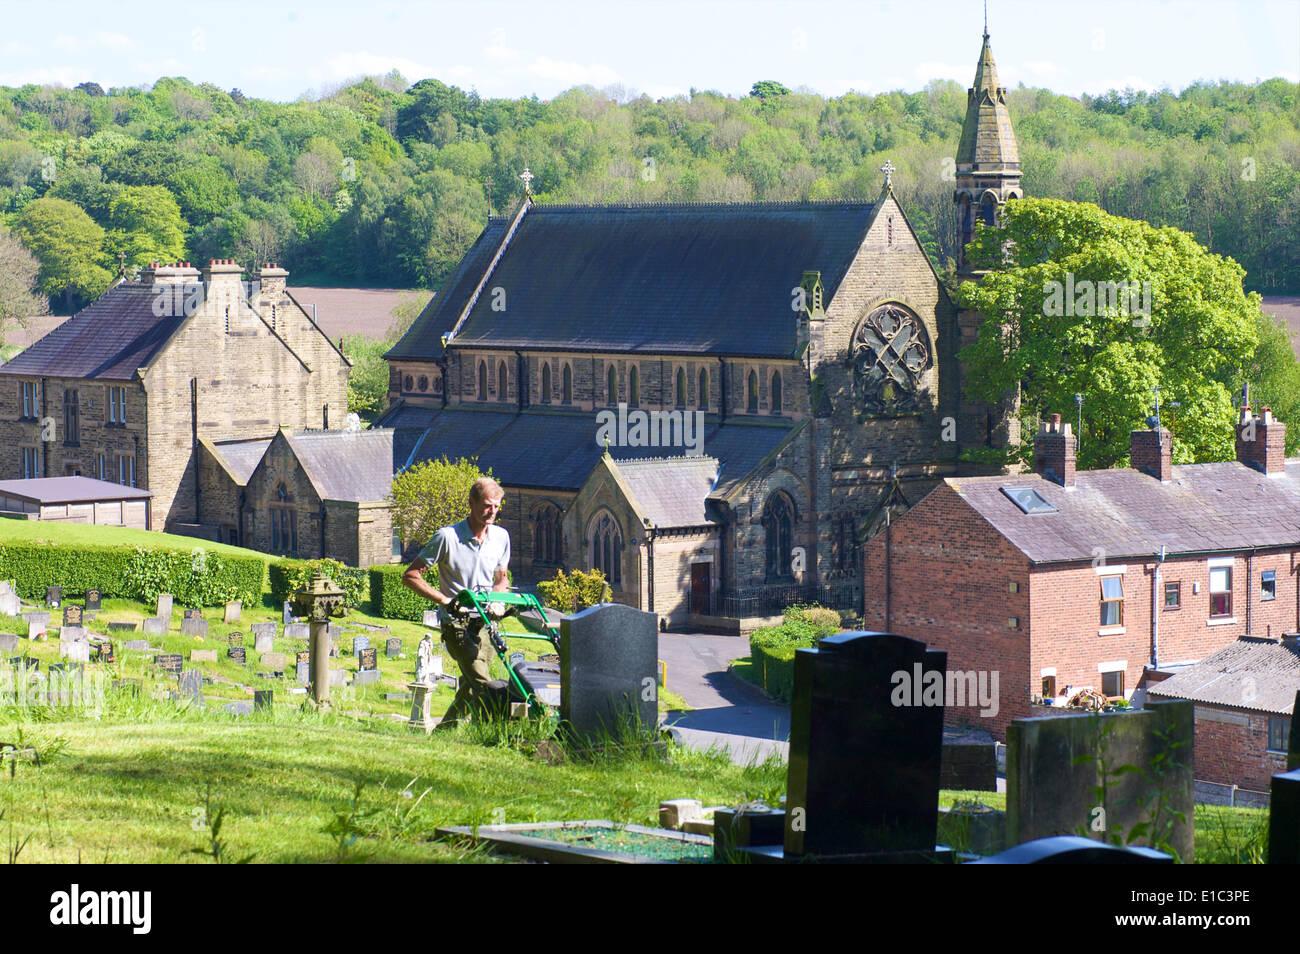 gardener-mowing-grass-in-cemetery-E1C3PE